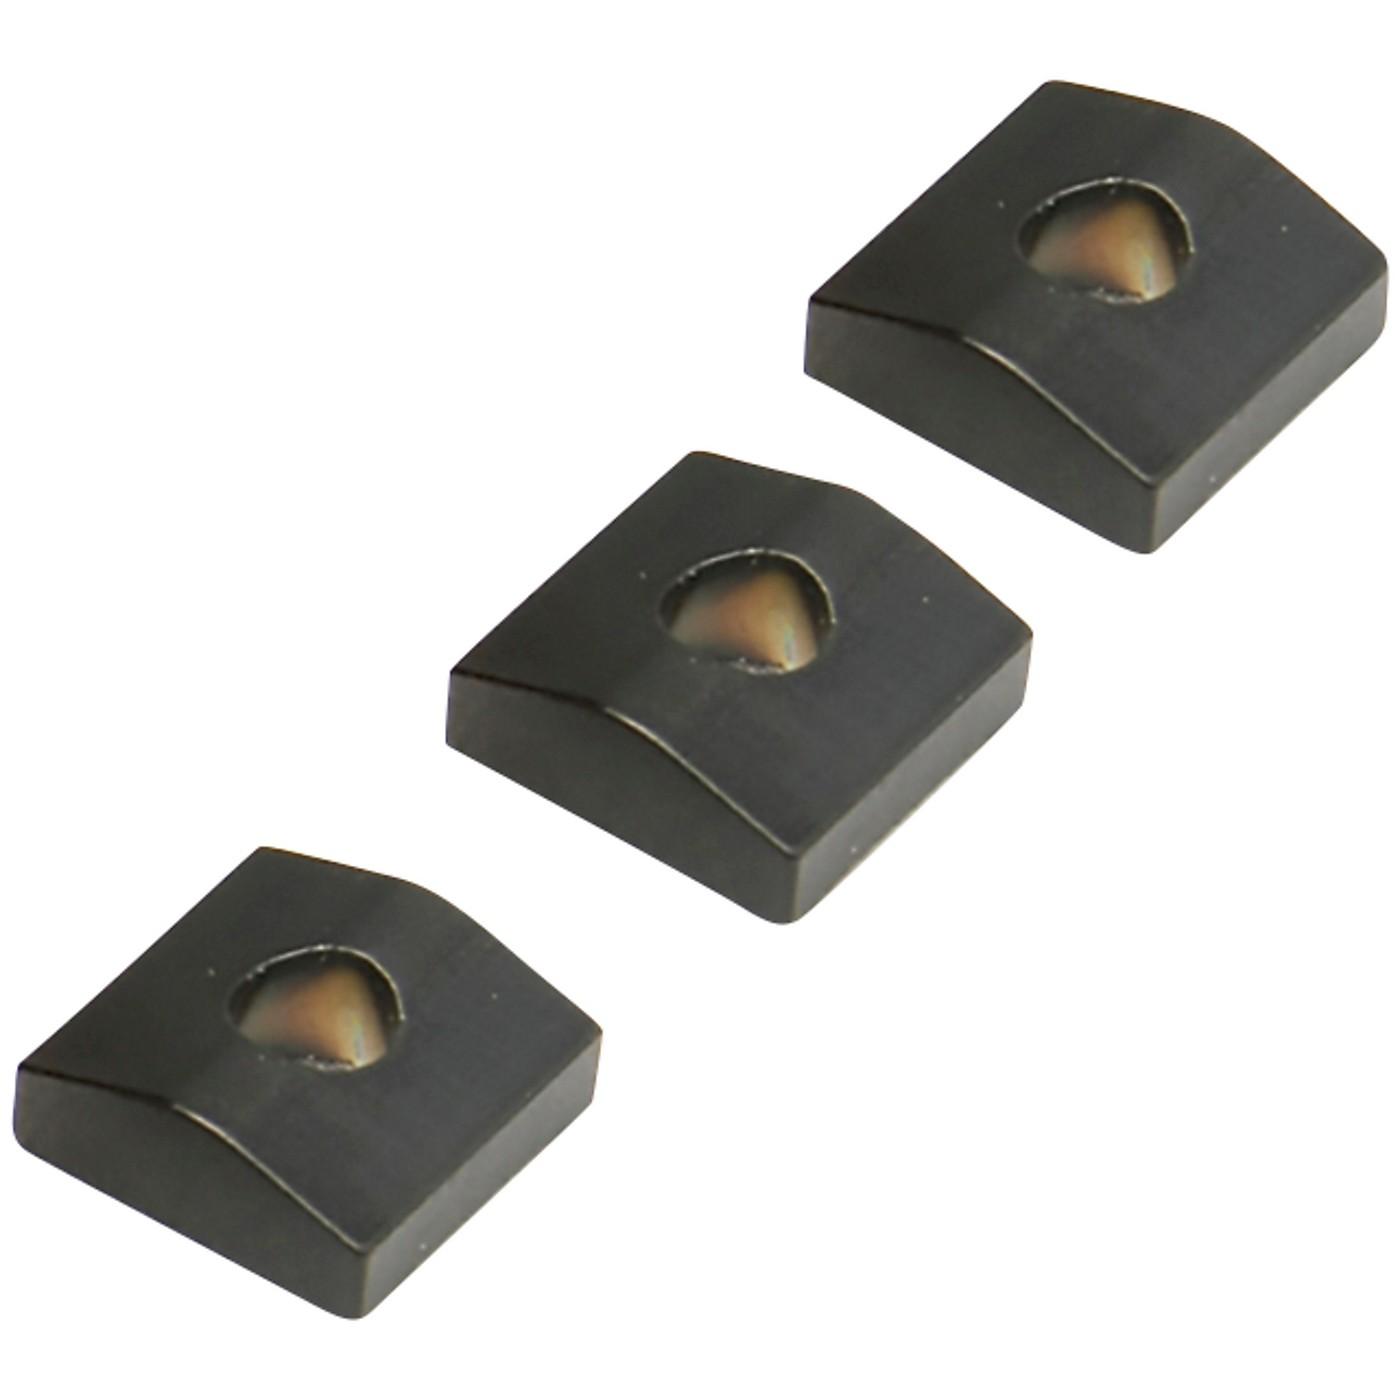 Floyd Rose Nut Clamping Blocks, Set of 3 thumbnail